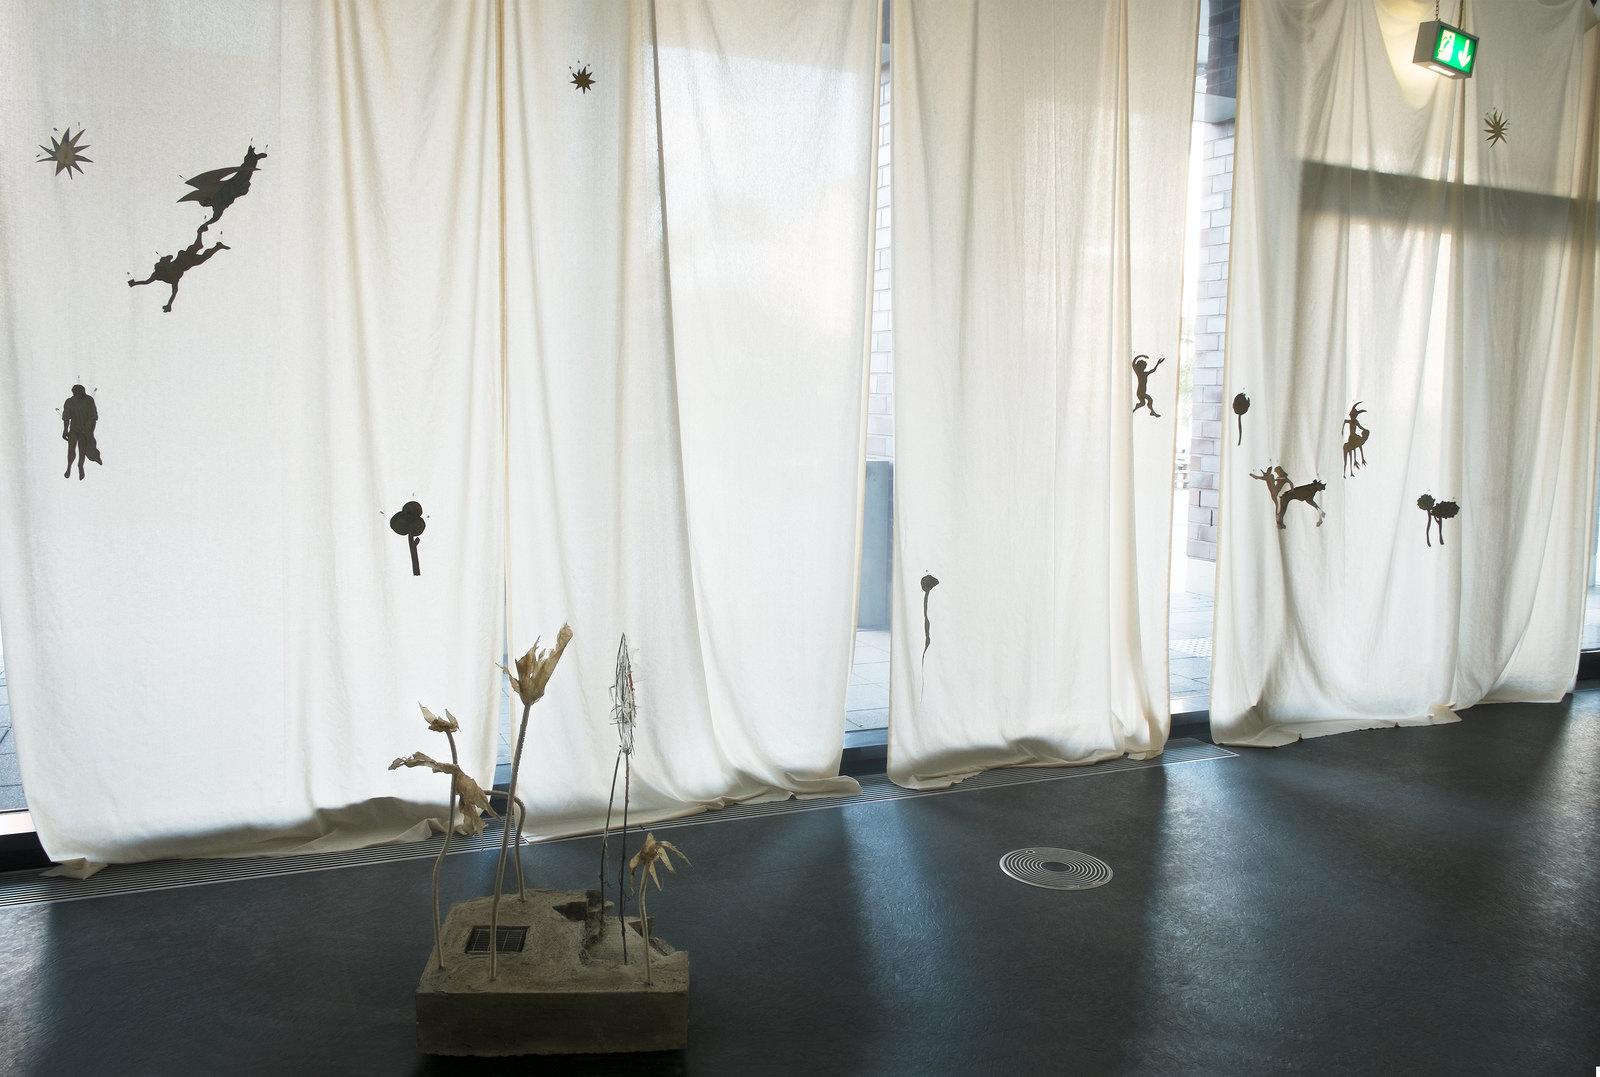 10_Installation view_ICHTS_2016_Dortmunder Kunstverein_Foto Niklas Taleb